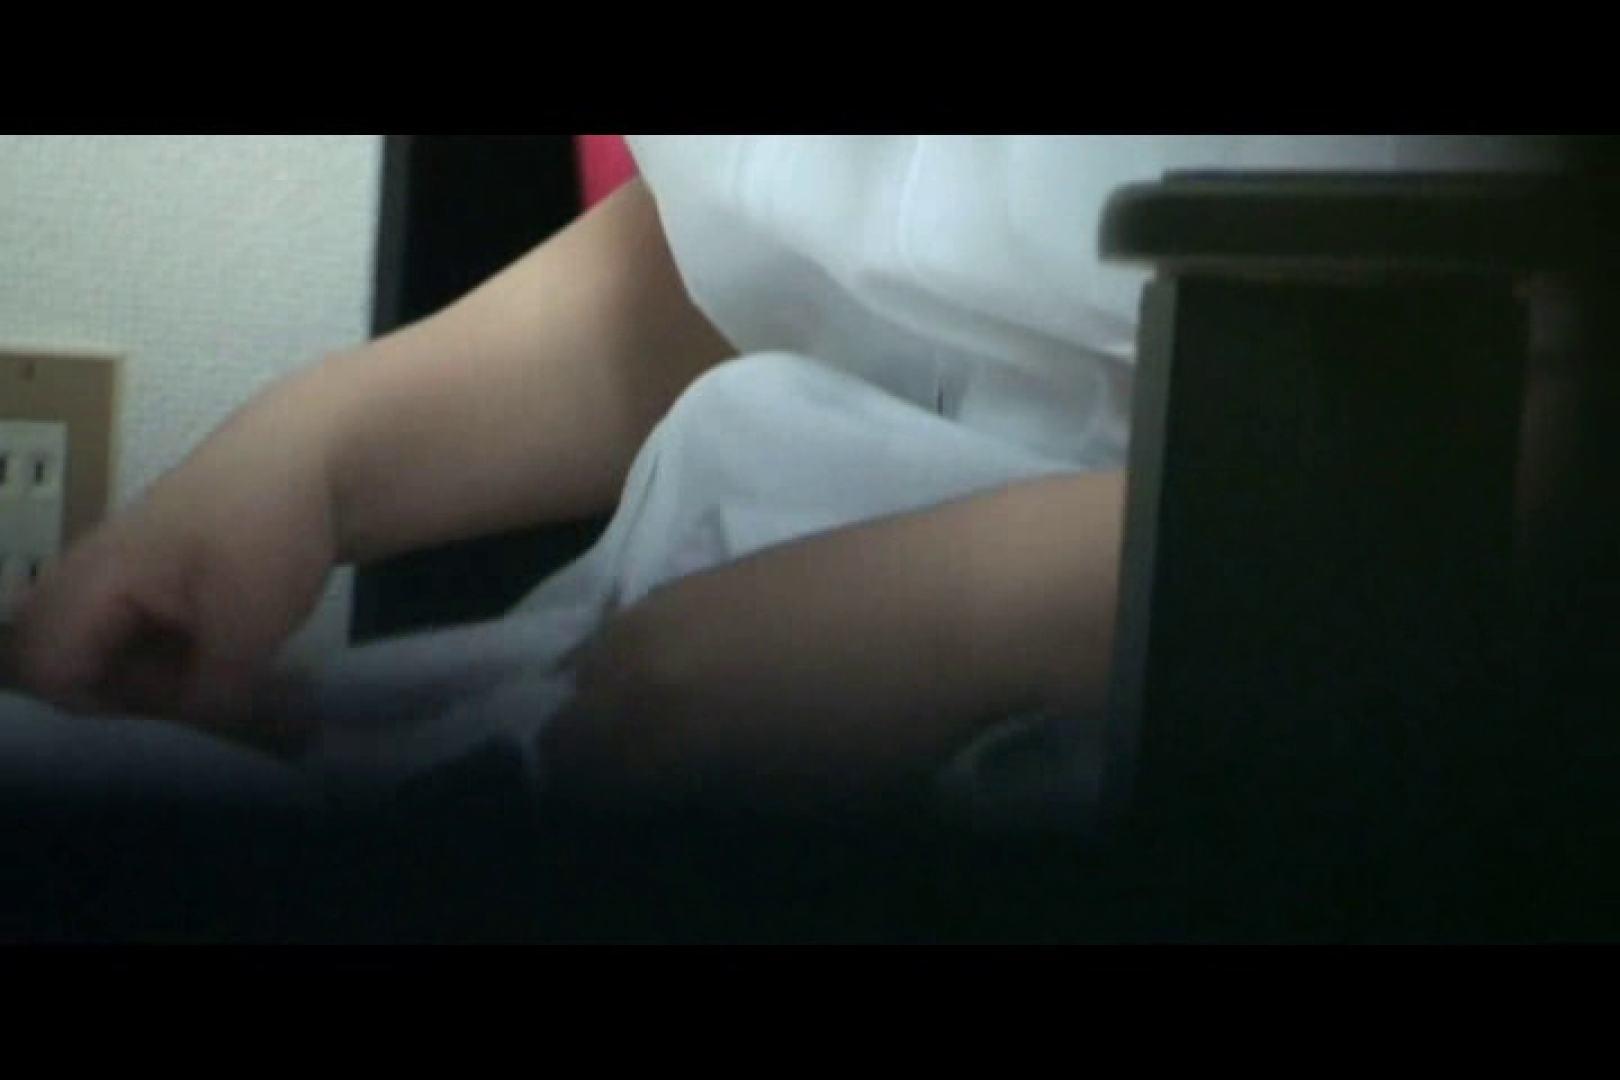 独占配信!無修正! 看護女子寮 vol.05 女子寮隠し撮り 性交動画流出 86pic 83